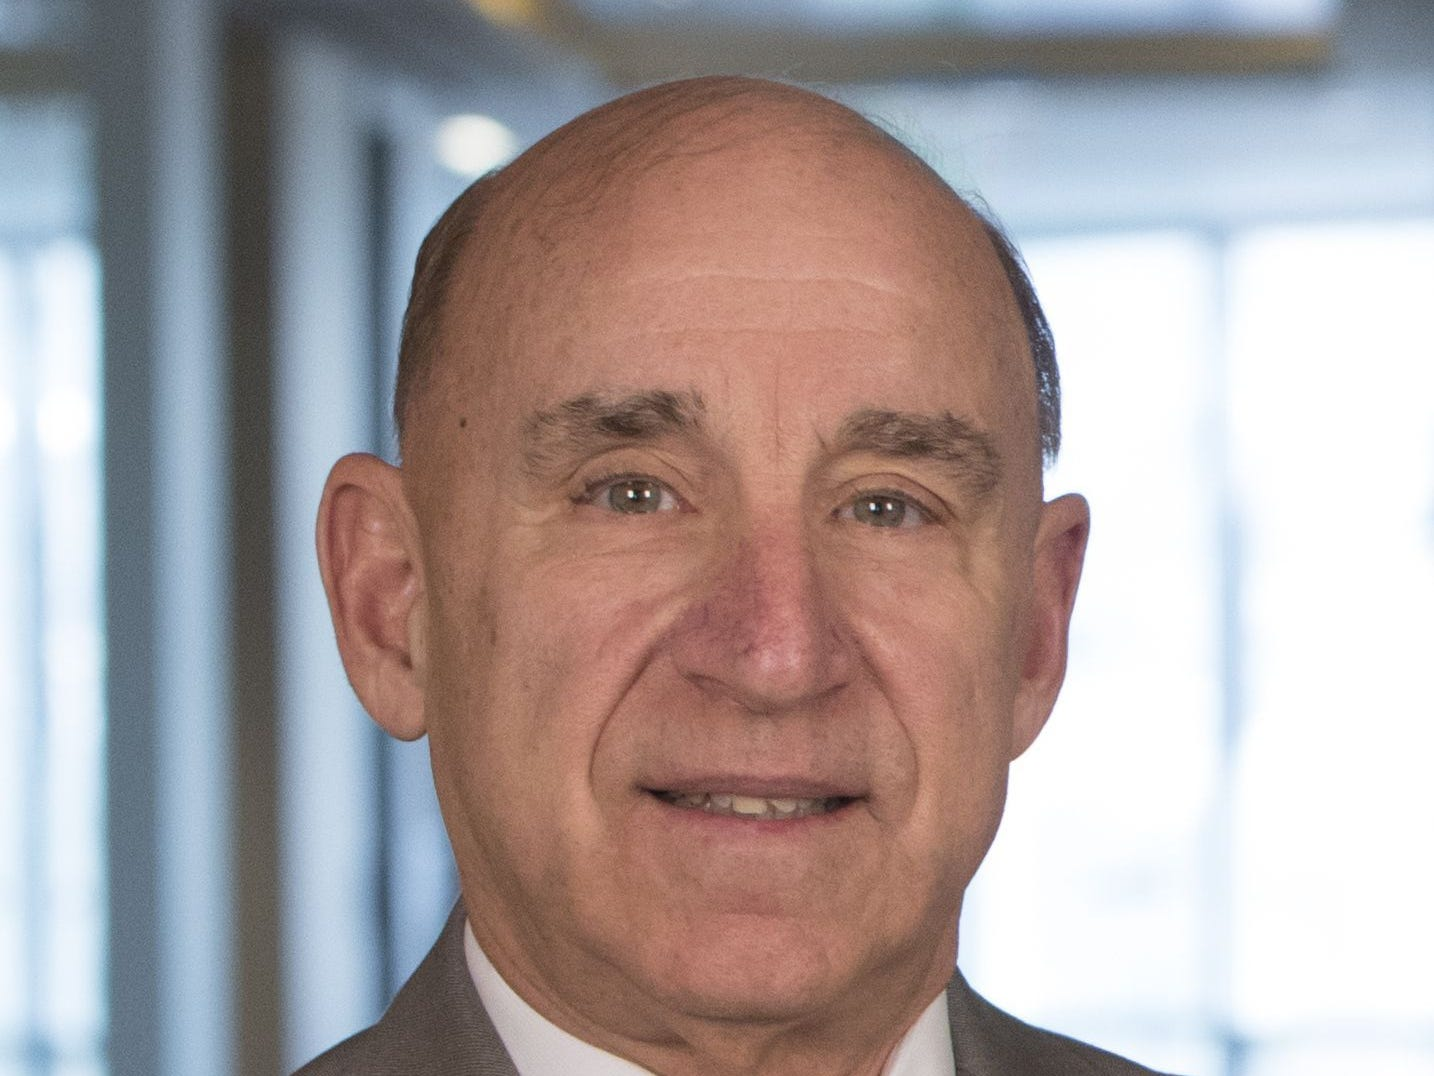 Vereit Inc.'s Glenn Rufrano: Summary compensation: $8,203,992. Adjusted compensation: $4,909,826. TTM profit: $49 million. TTM revenue: $1.3 billion. 2017 stock: (1.4 percent). Capitalization: $7.4 billion.